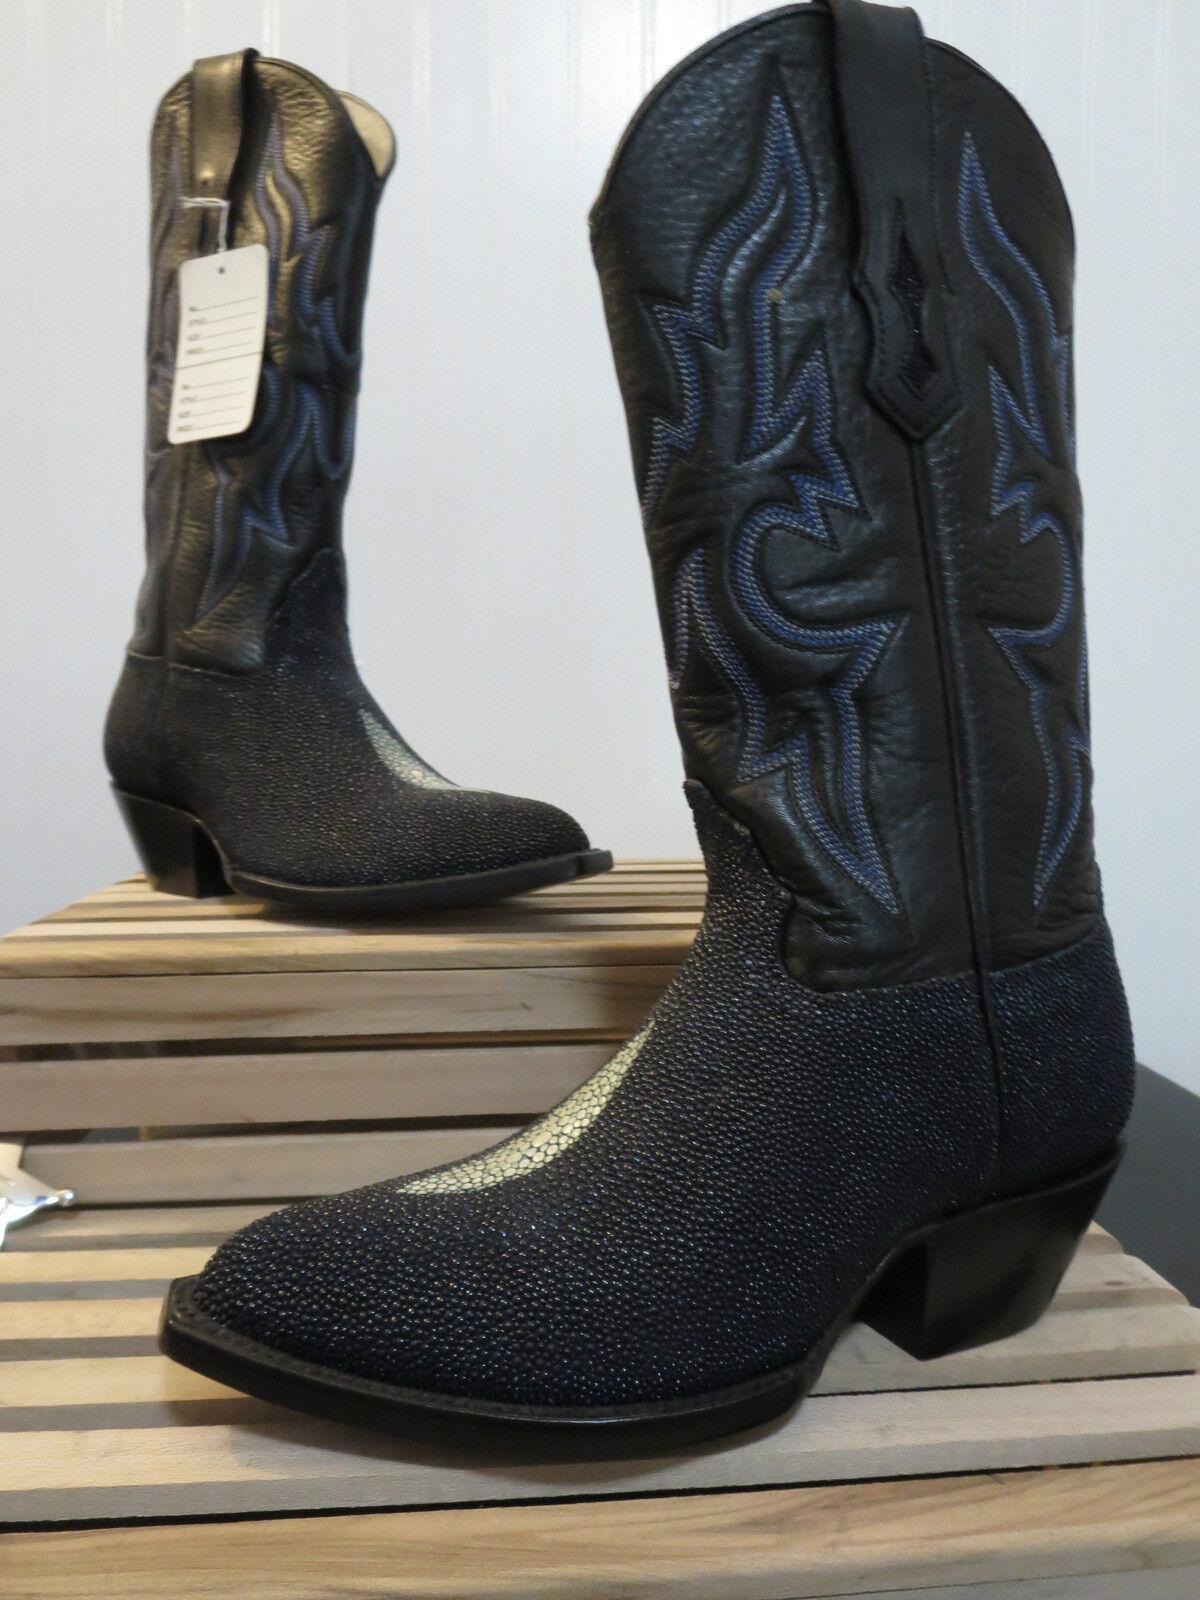 Star Boots Women's Dark Navy Blue Stingray Triad Boot W9002 Size 5.5 B, NEW